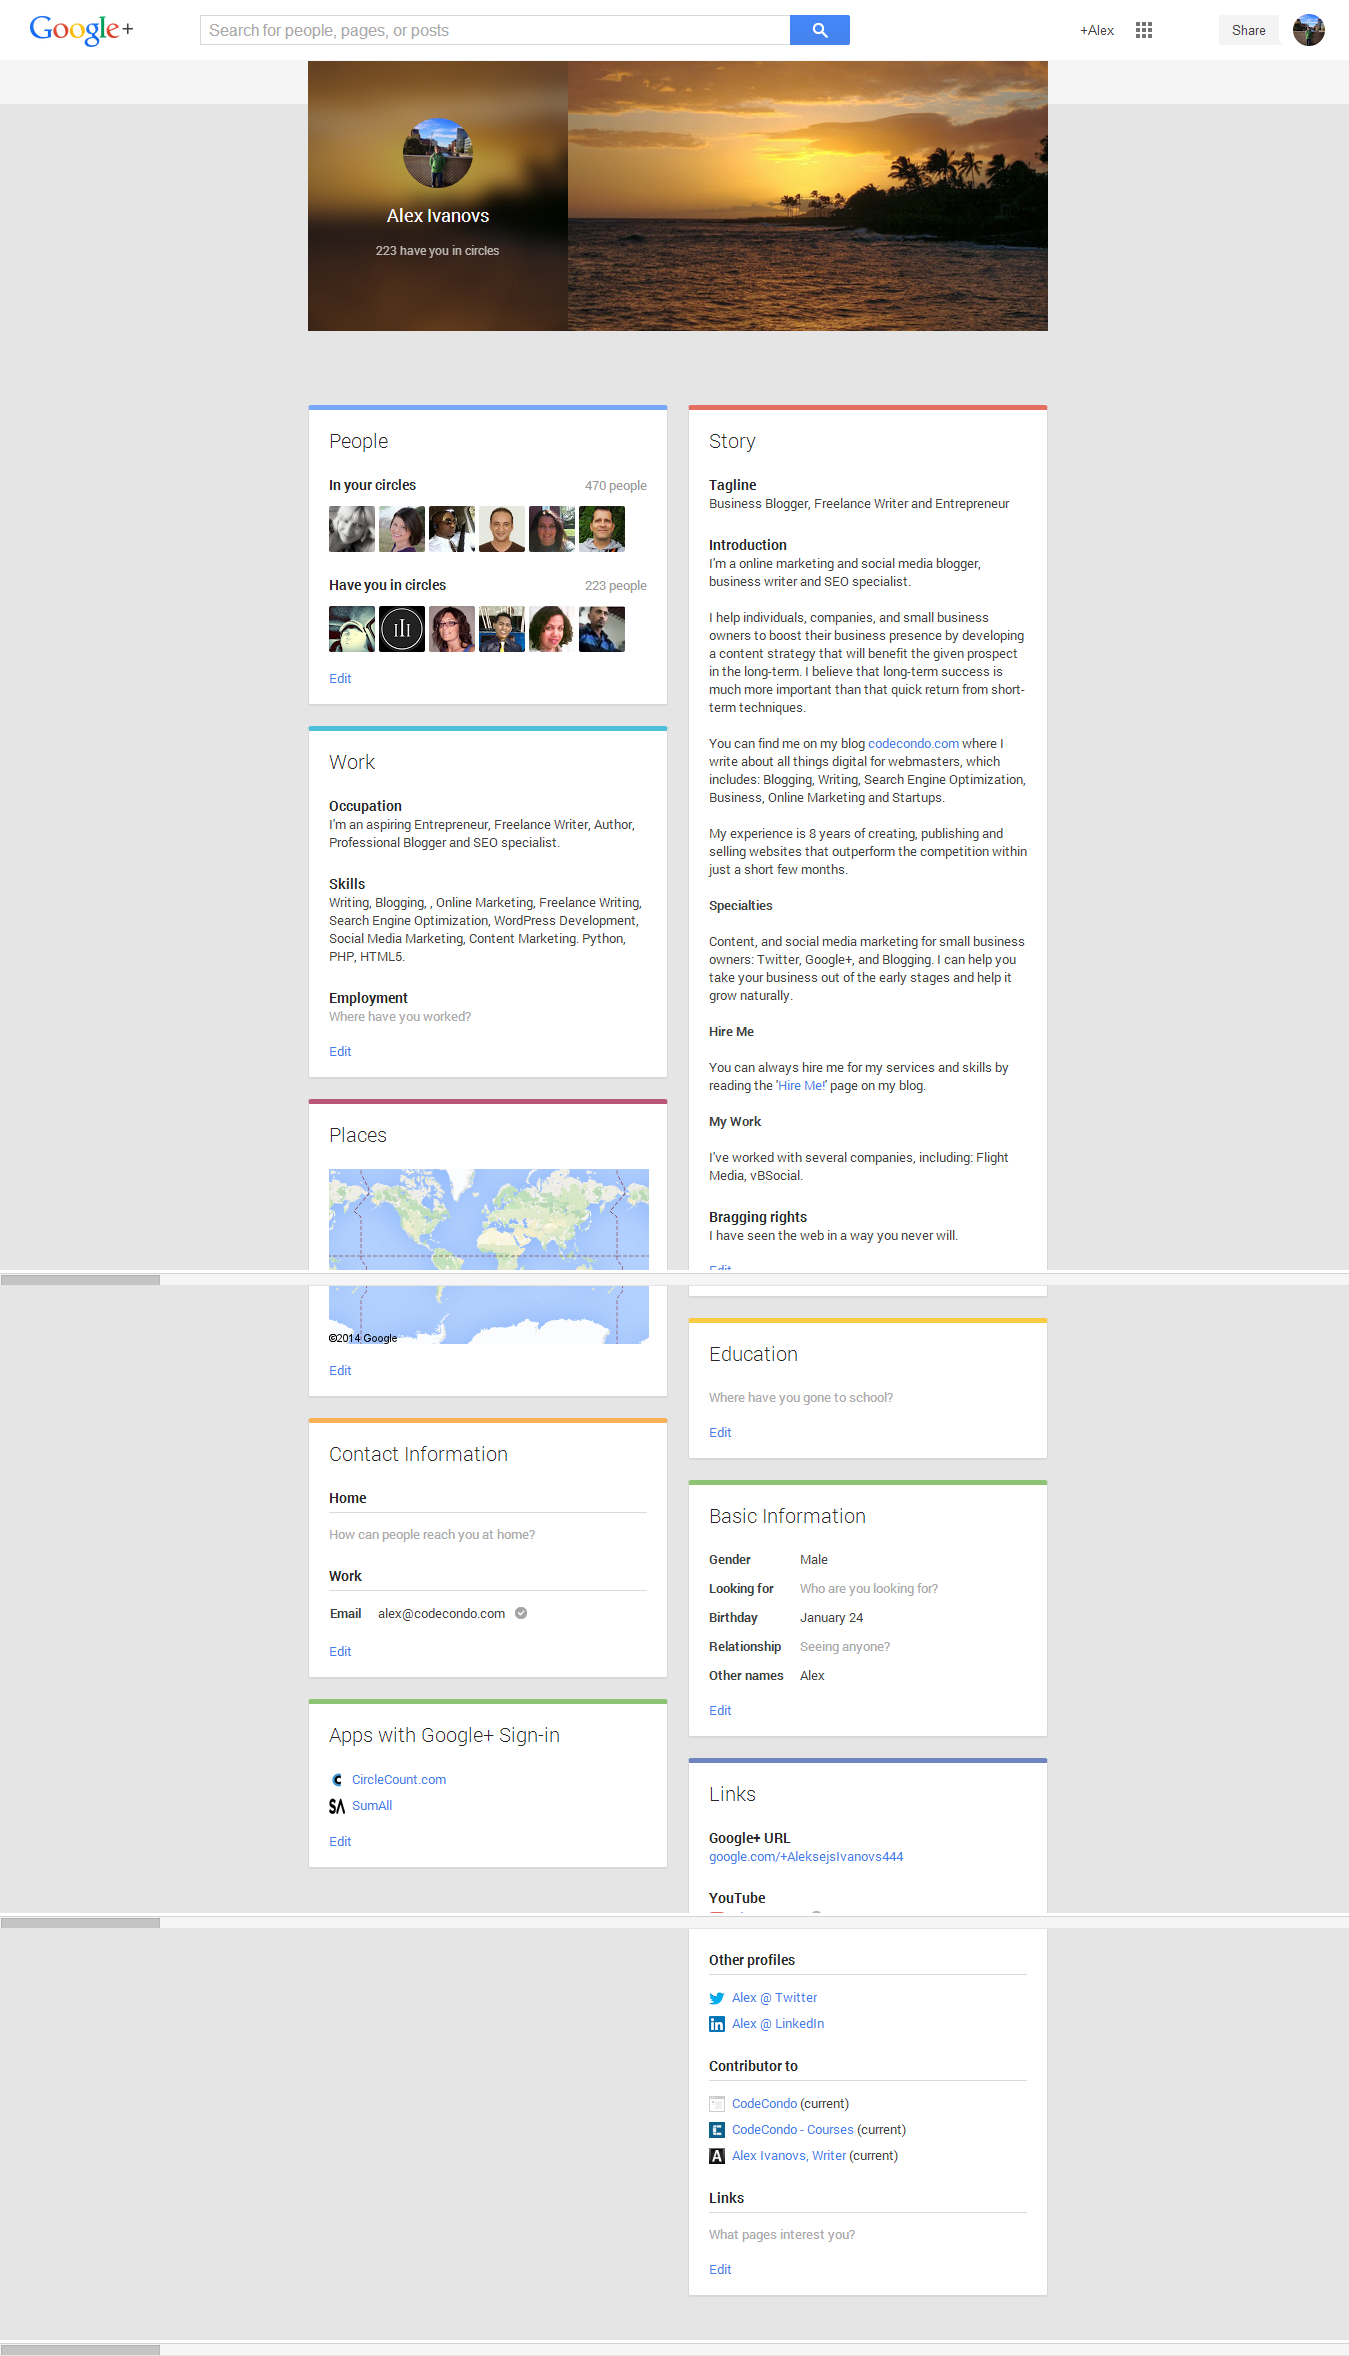 Google+ Full Profile